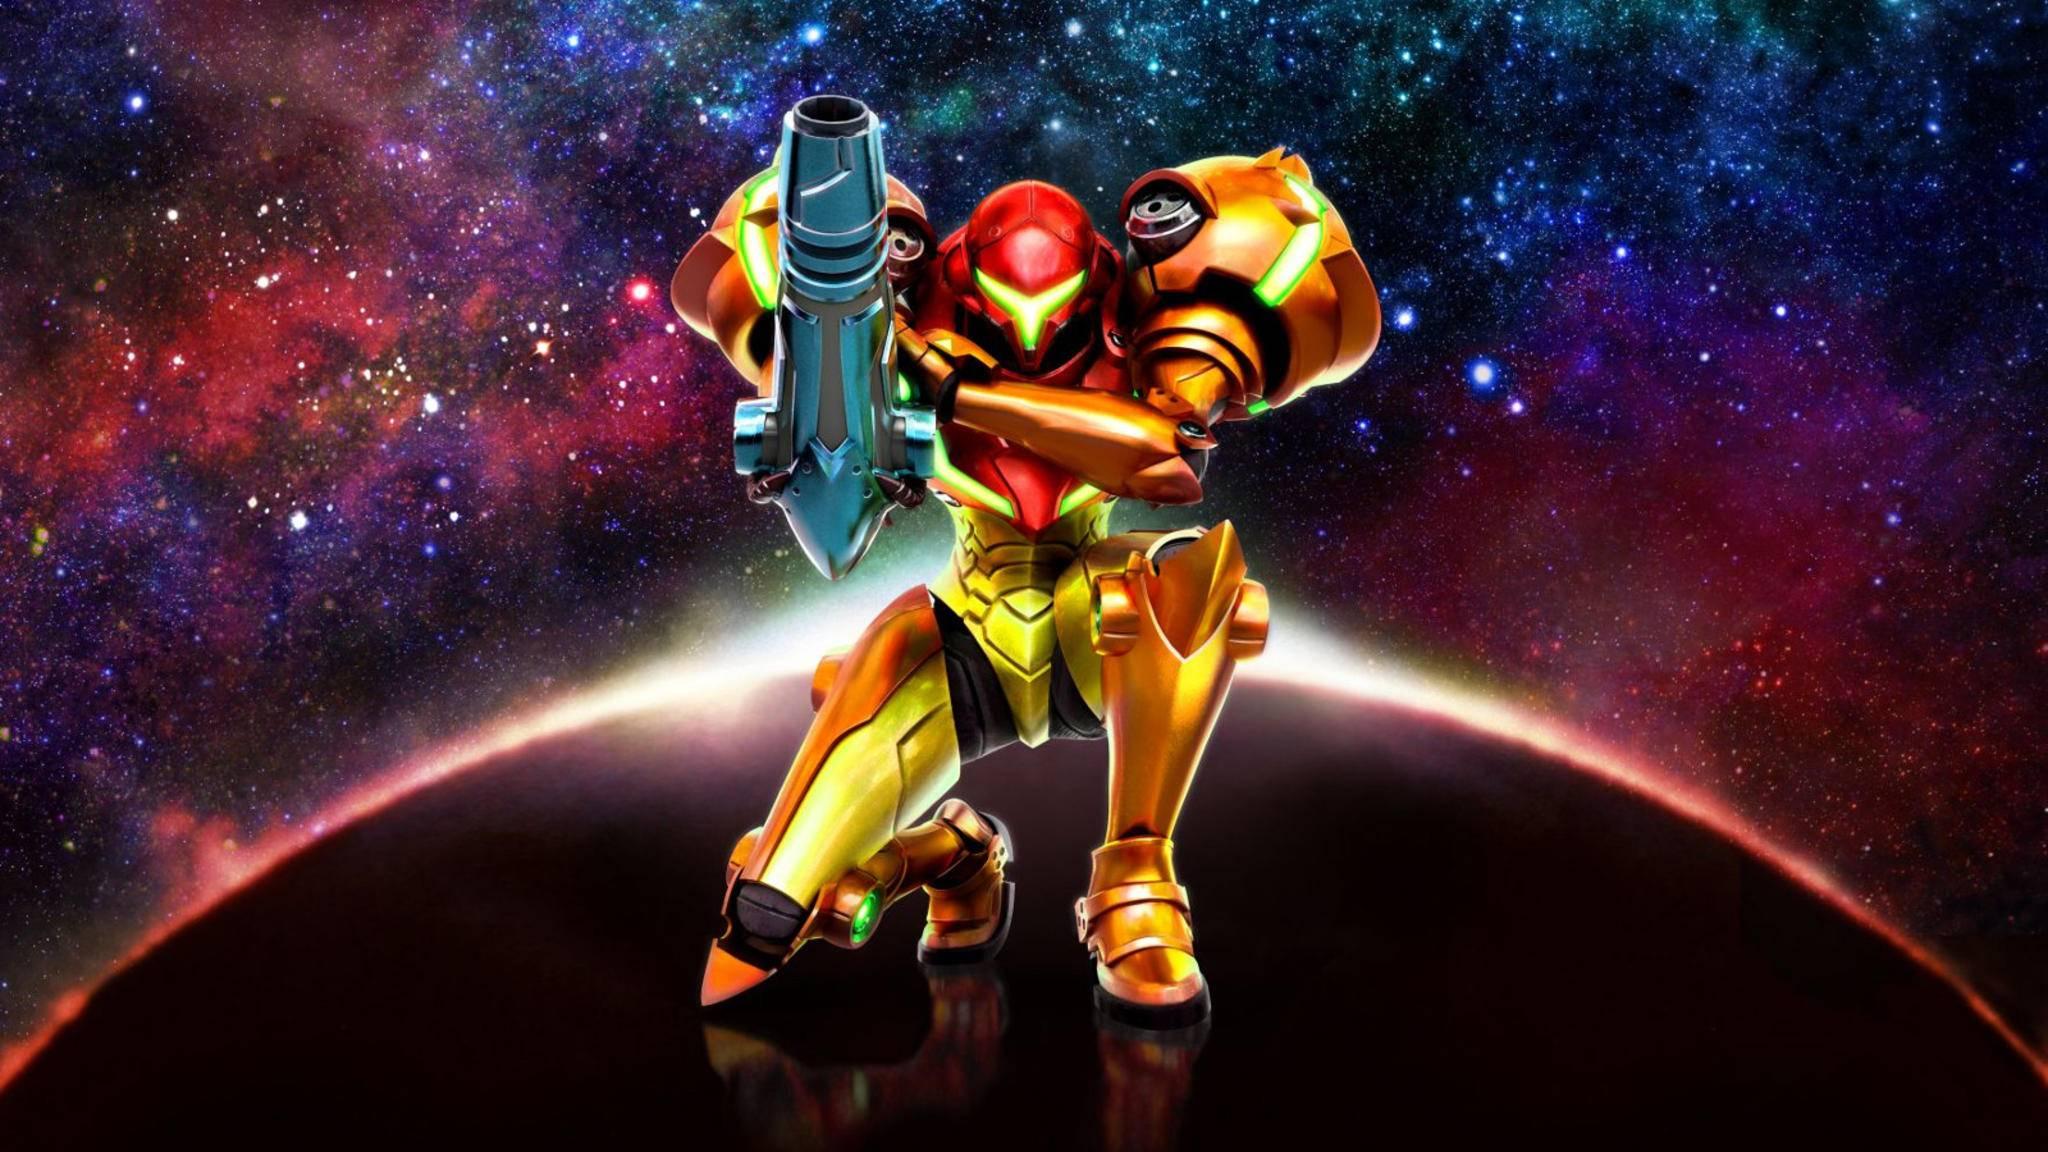 """Ist ""Metroid Prime 4"" auch bei Bandai Namco in der Mache?"